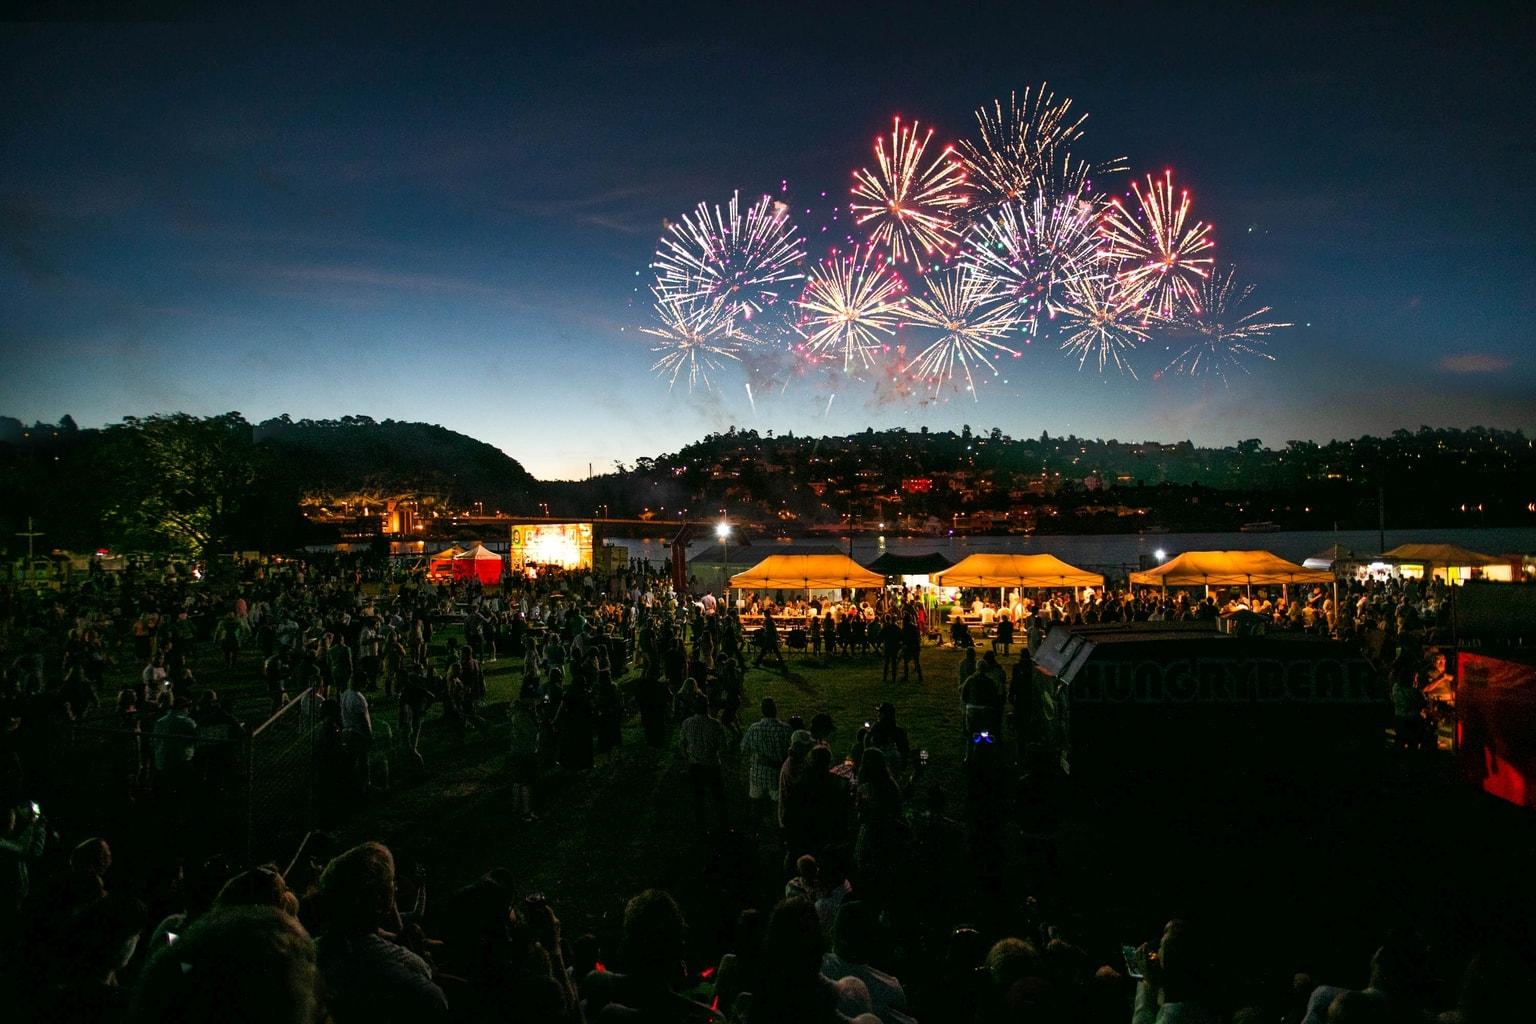 BeerFest returns to Launceston